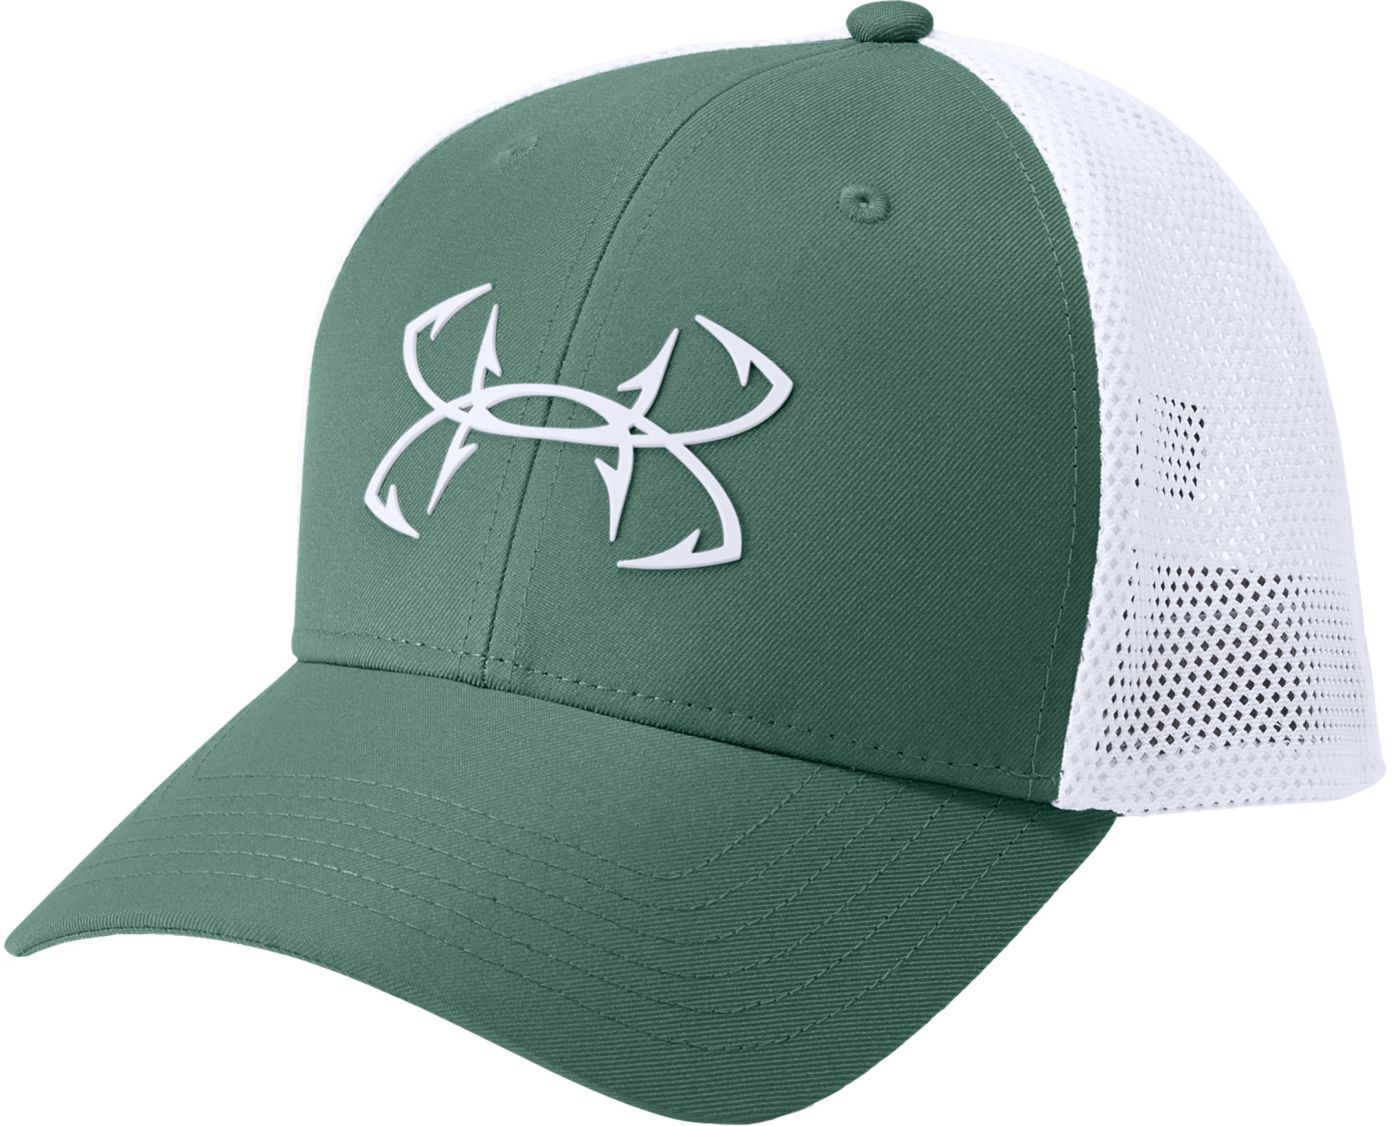 Under Armour Men's Fish Hunter Trucker Hat